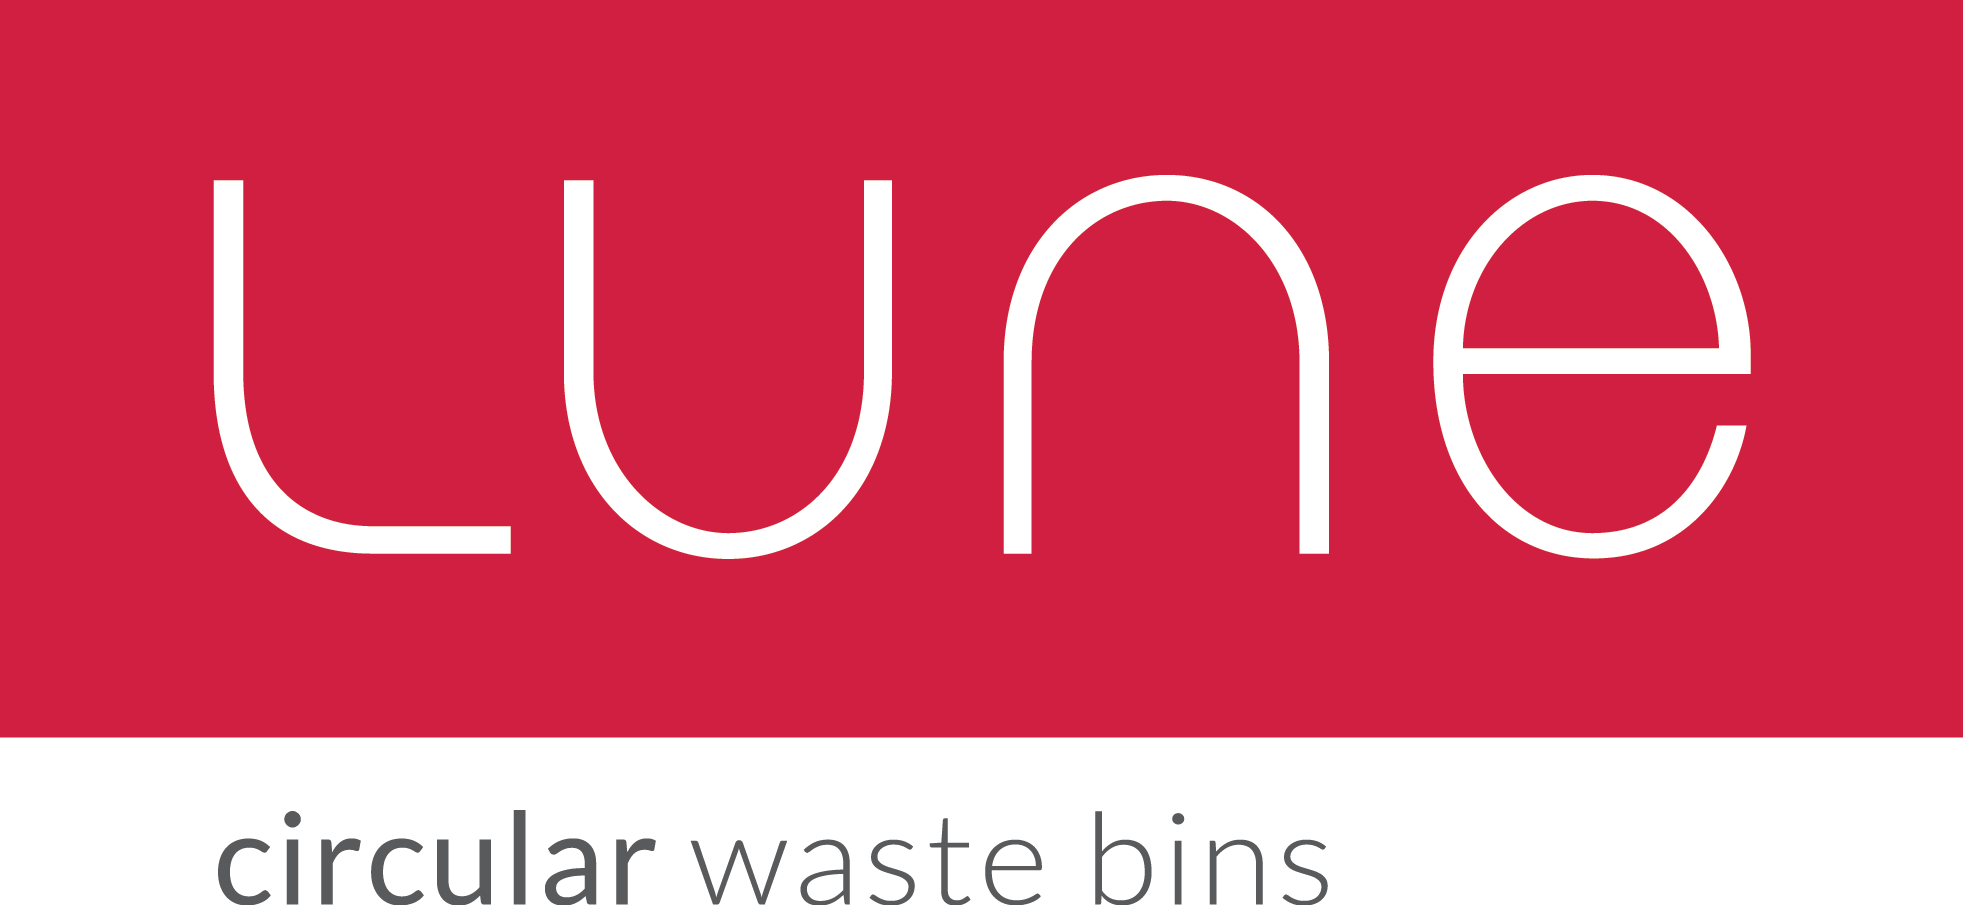 Airport Waste Bins